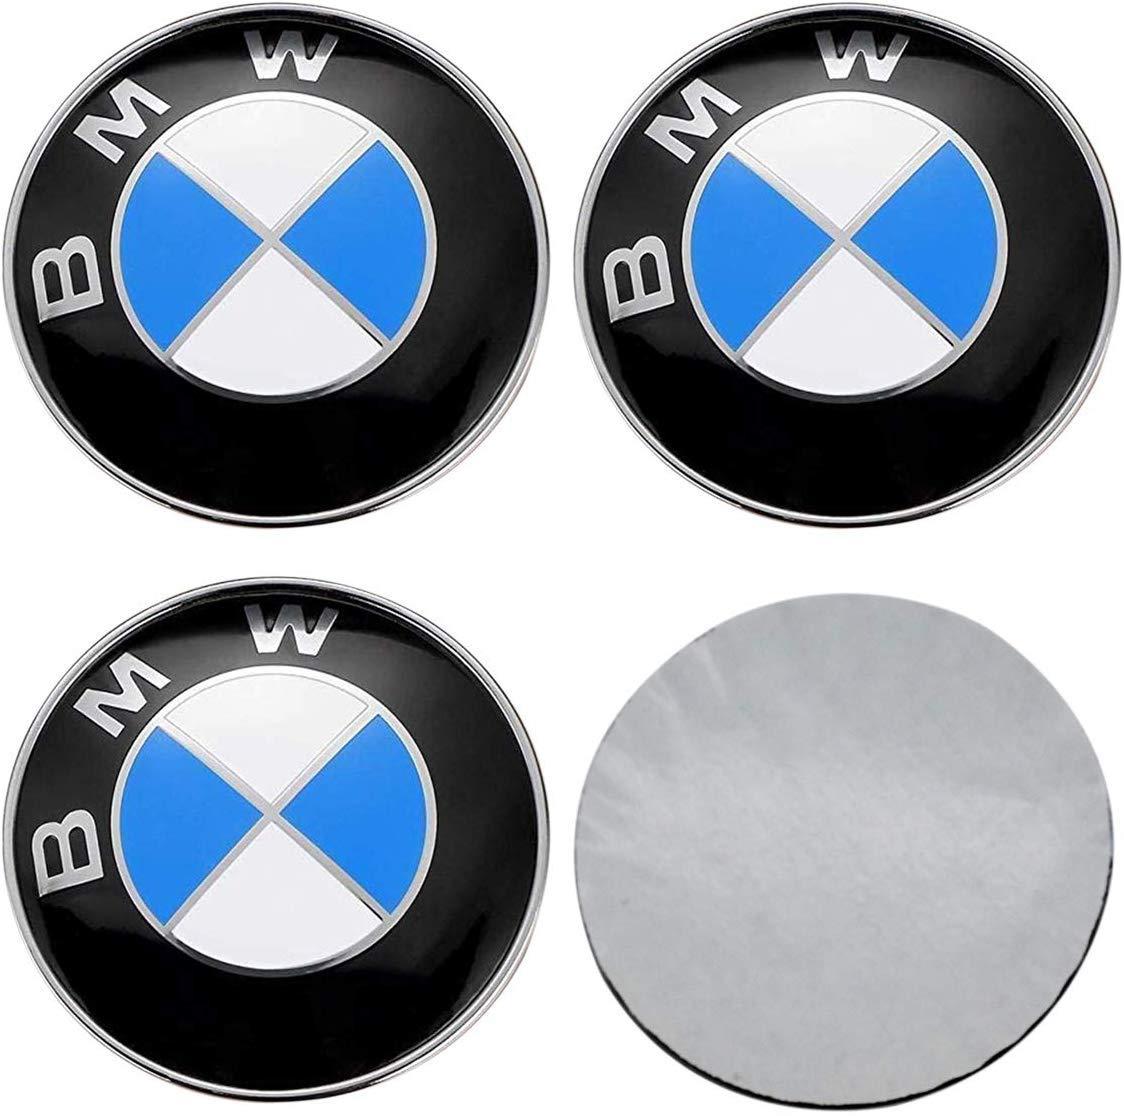 Tire Valve Stem Caps Cover for BMW Keychain for BMW 9pcs,65mm BMW Emblem Badge Sticker Wheel Hub Caps Centre Cover